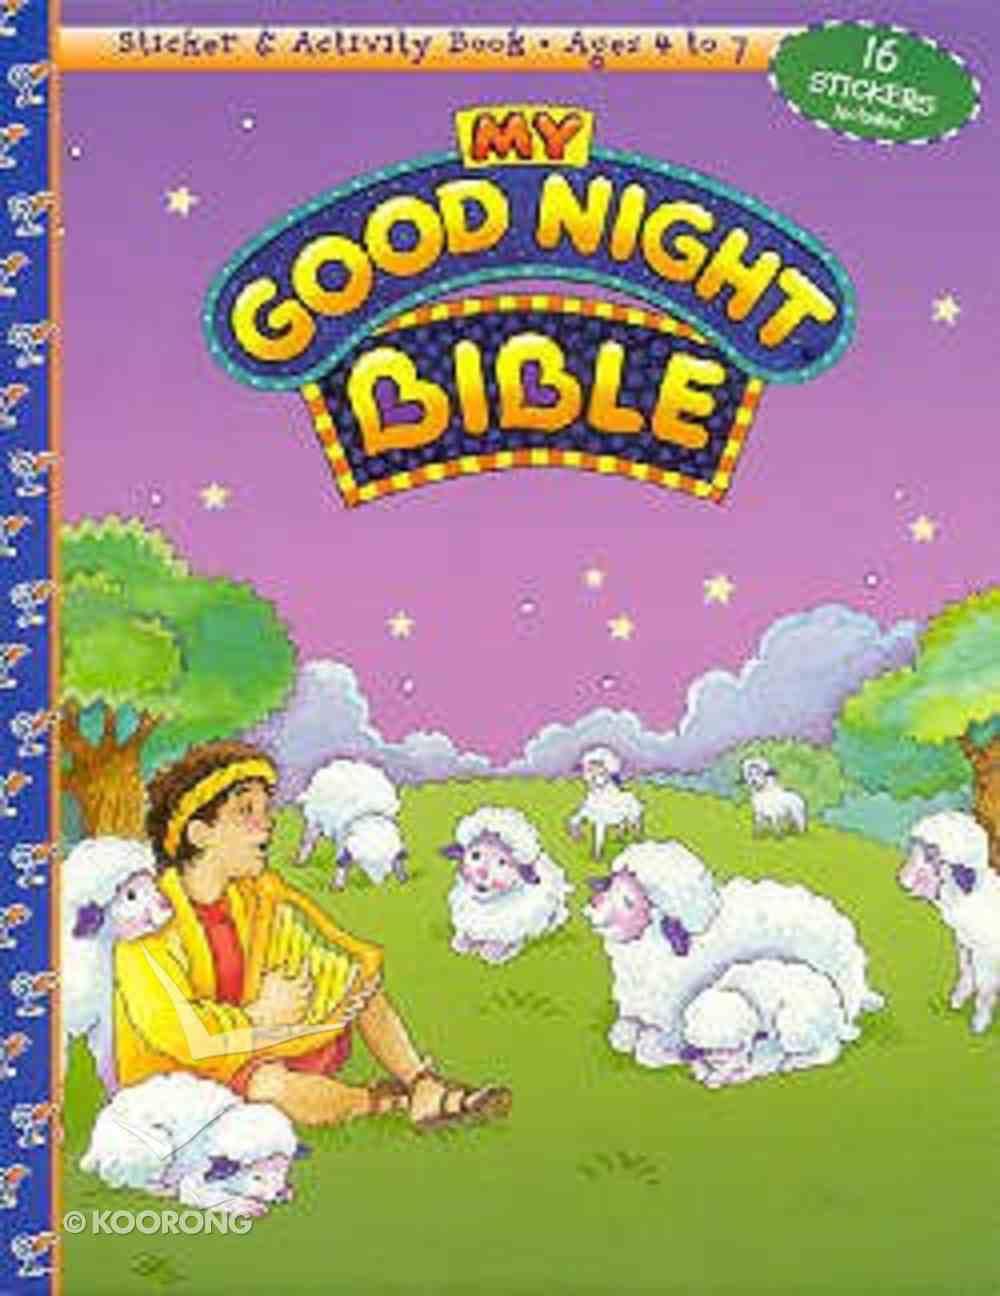 My Good Night Bible (Sticker & Activity Series) Paperback